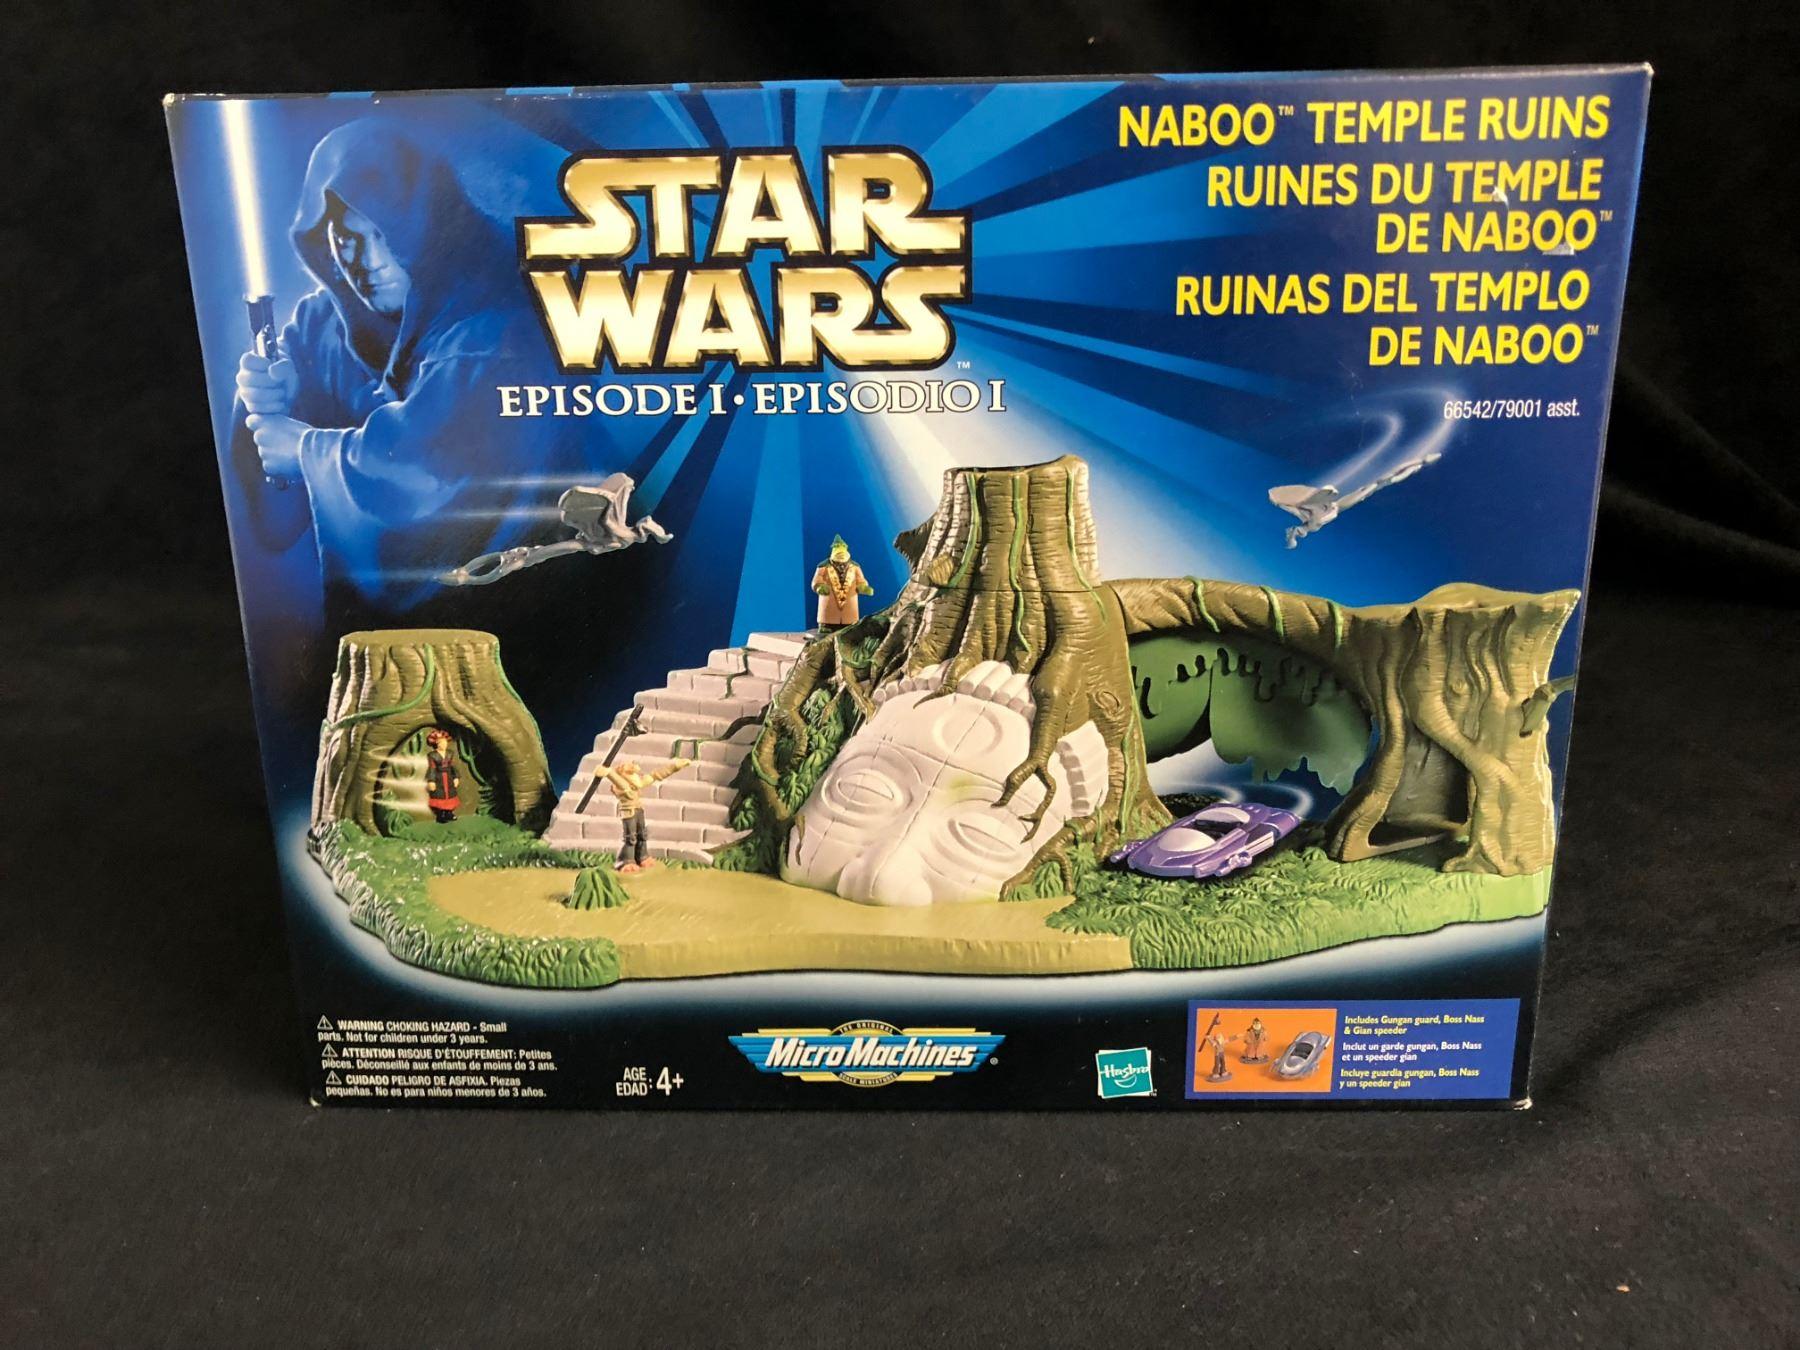 Star Wars Episode I Micro Machines Naboo Temple Ruins